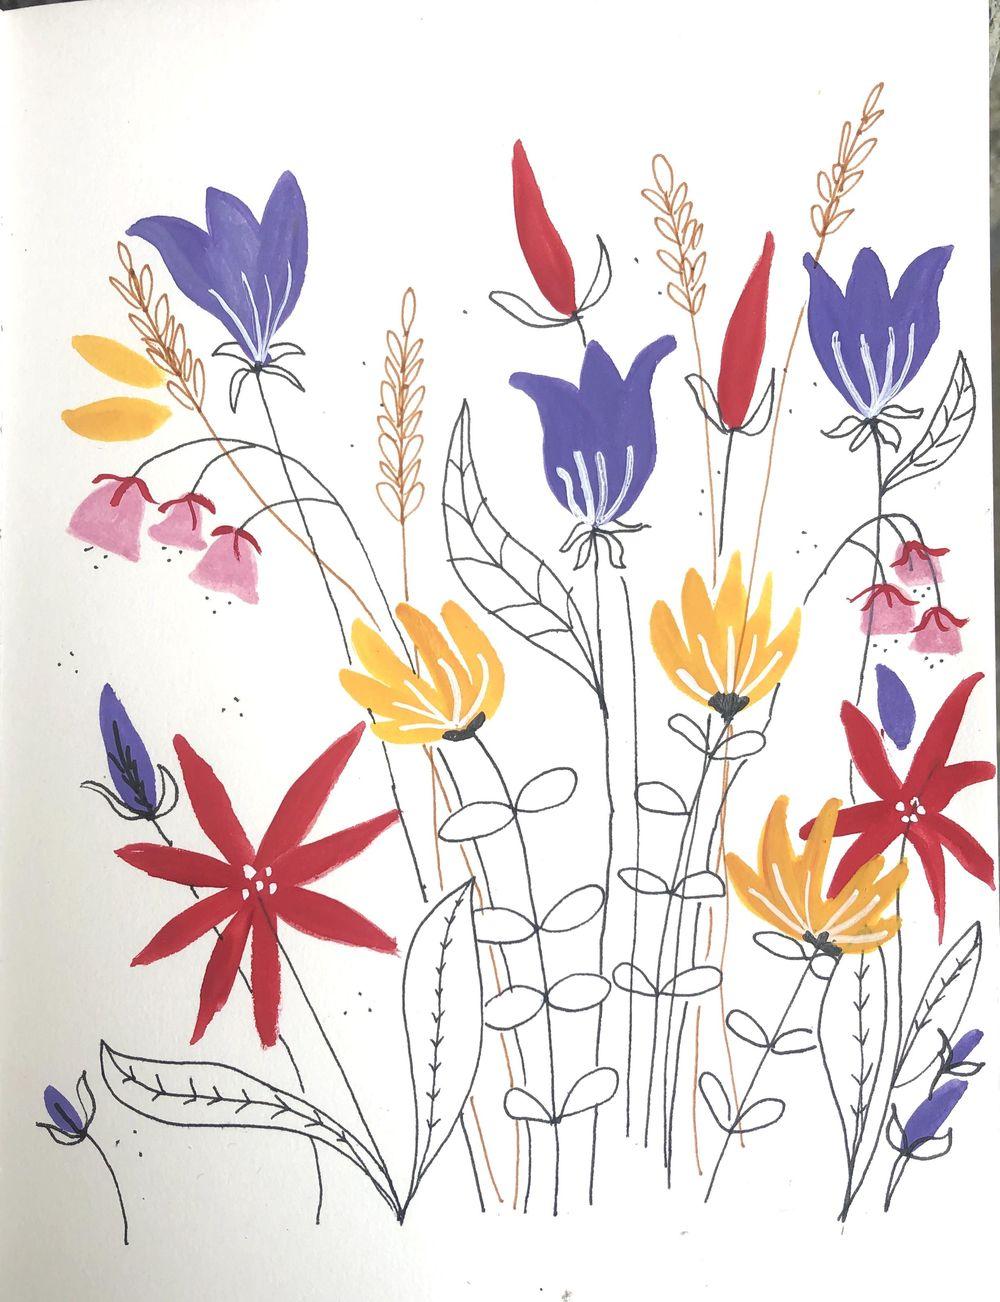 Decorative flowers - image 1 - student project